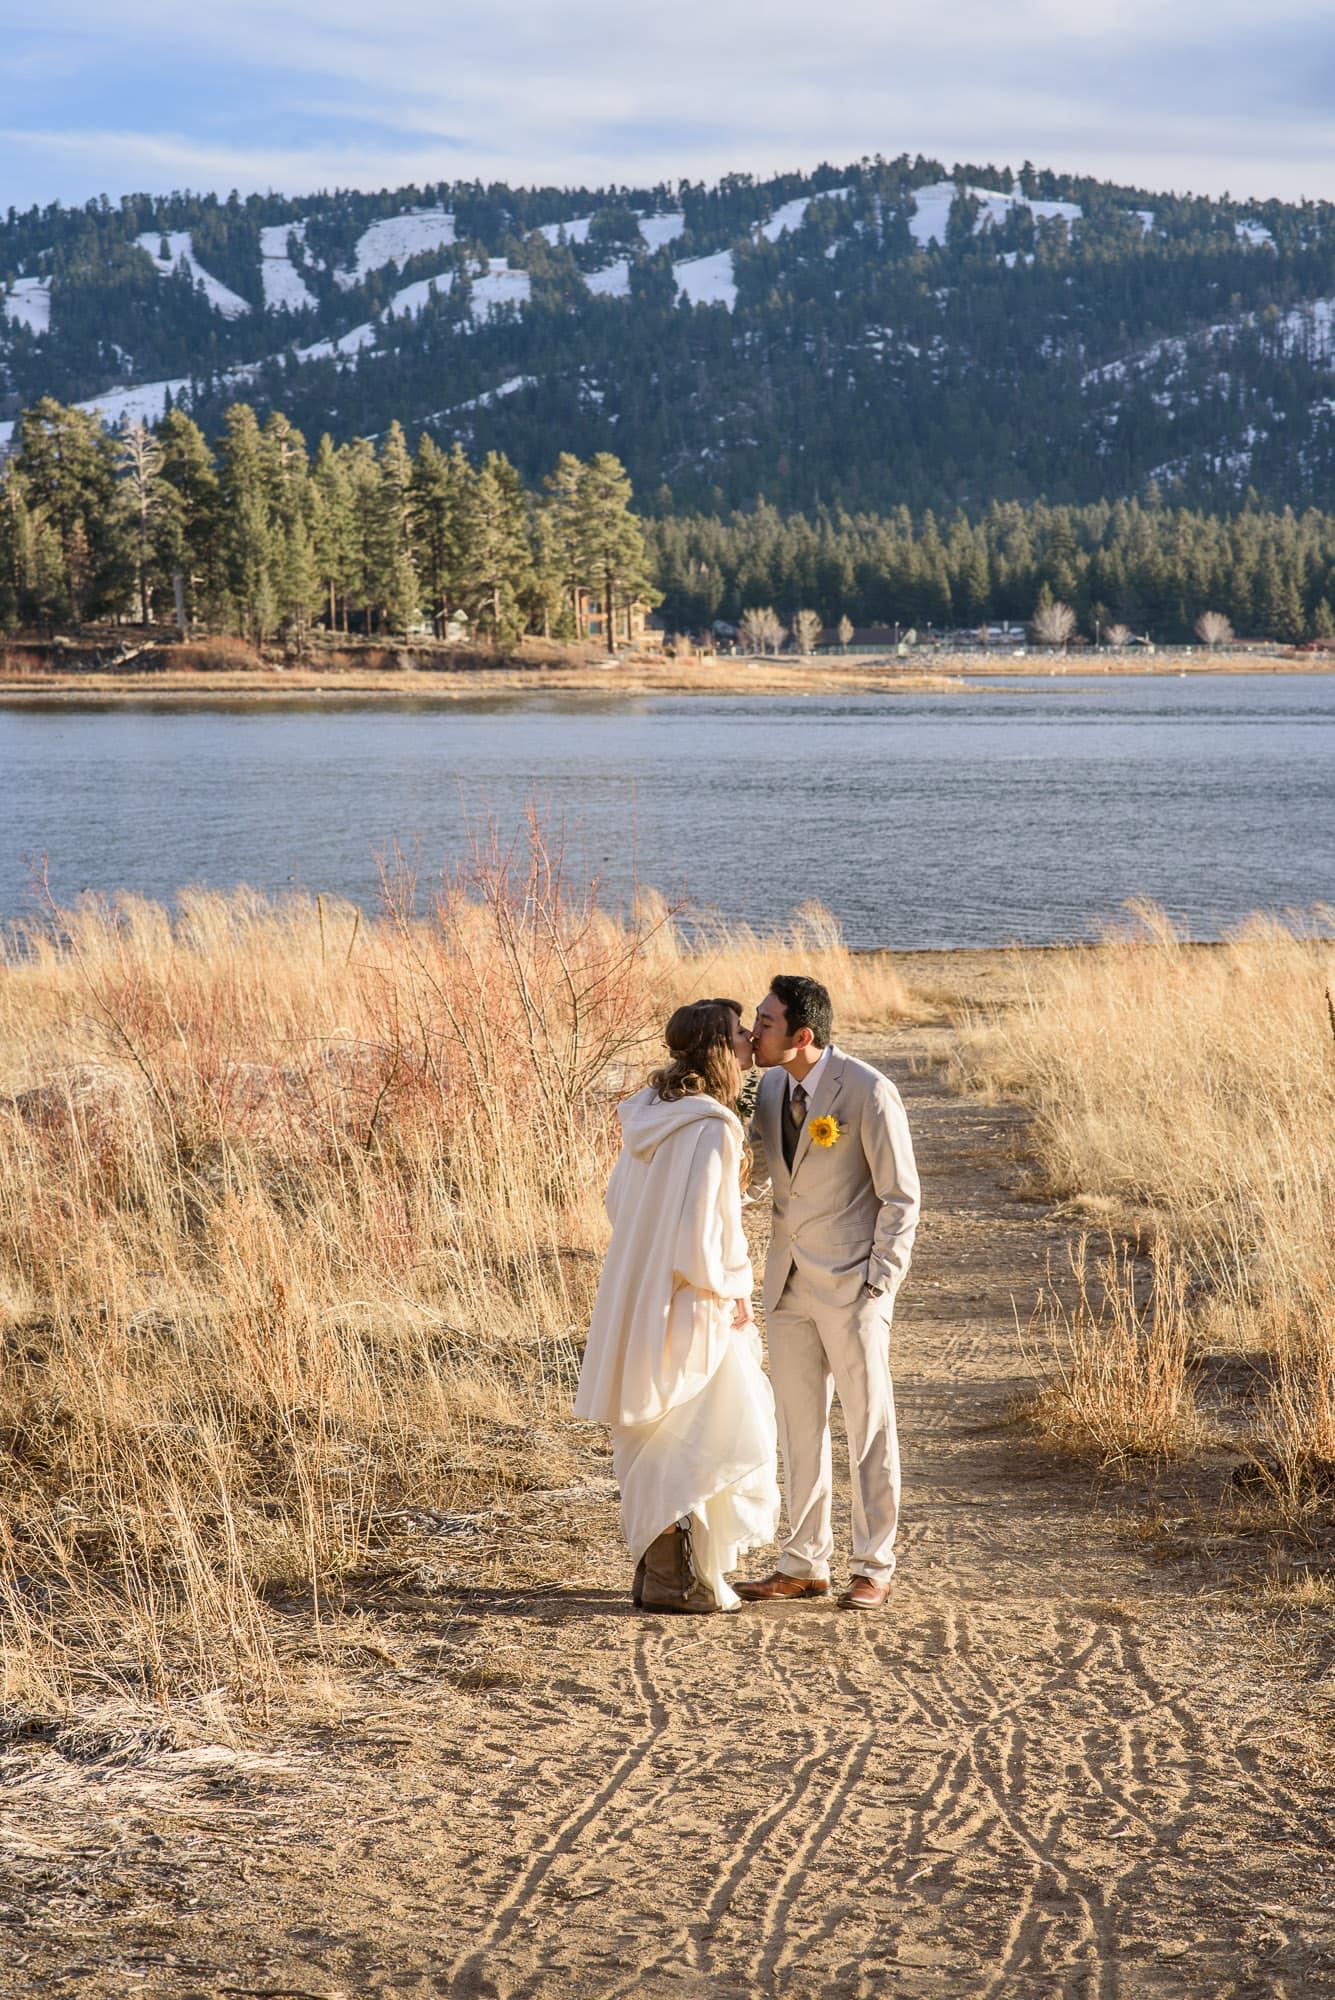 007_Alan_and_Heidi_Big_Bear_Lake_Elopement_Winter